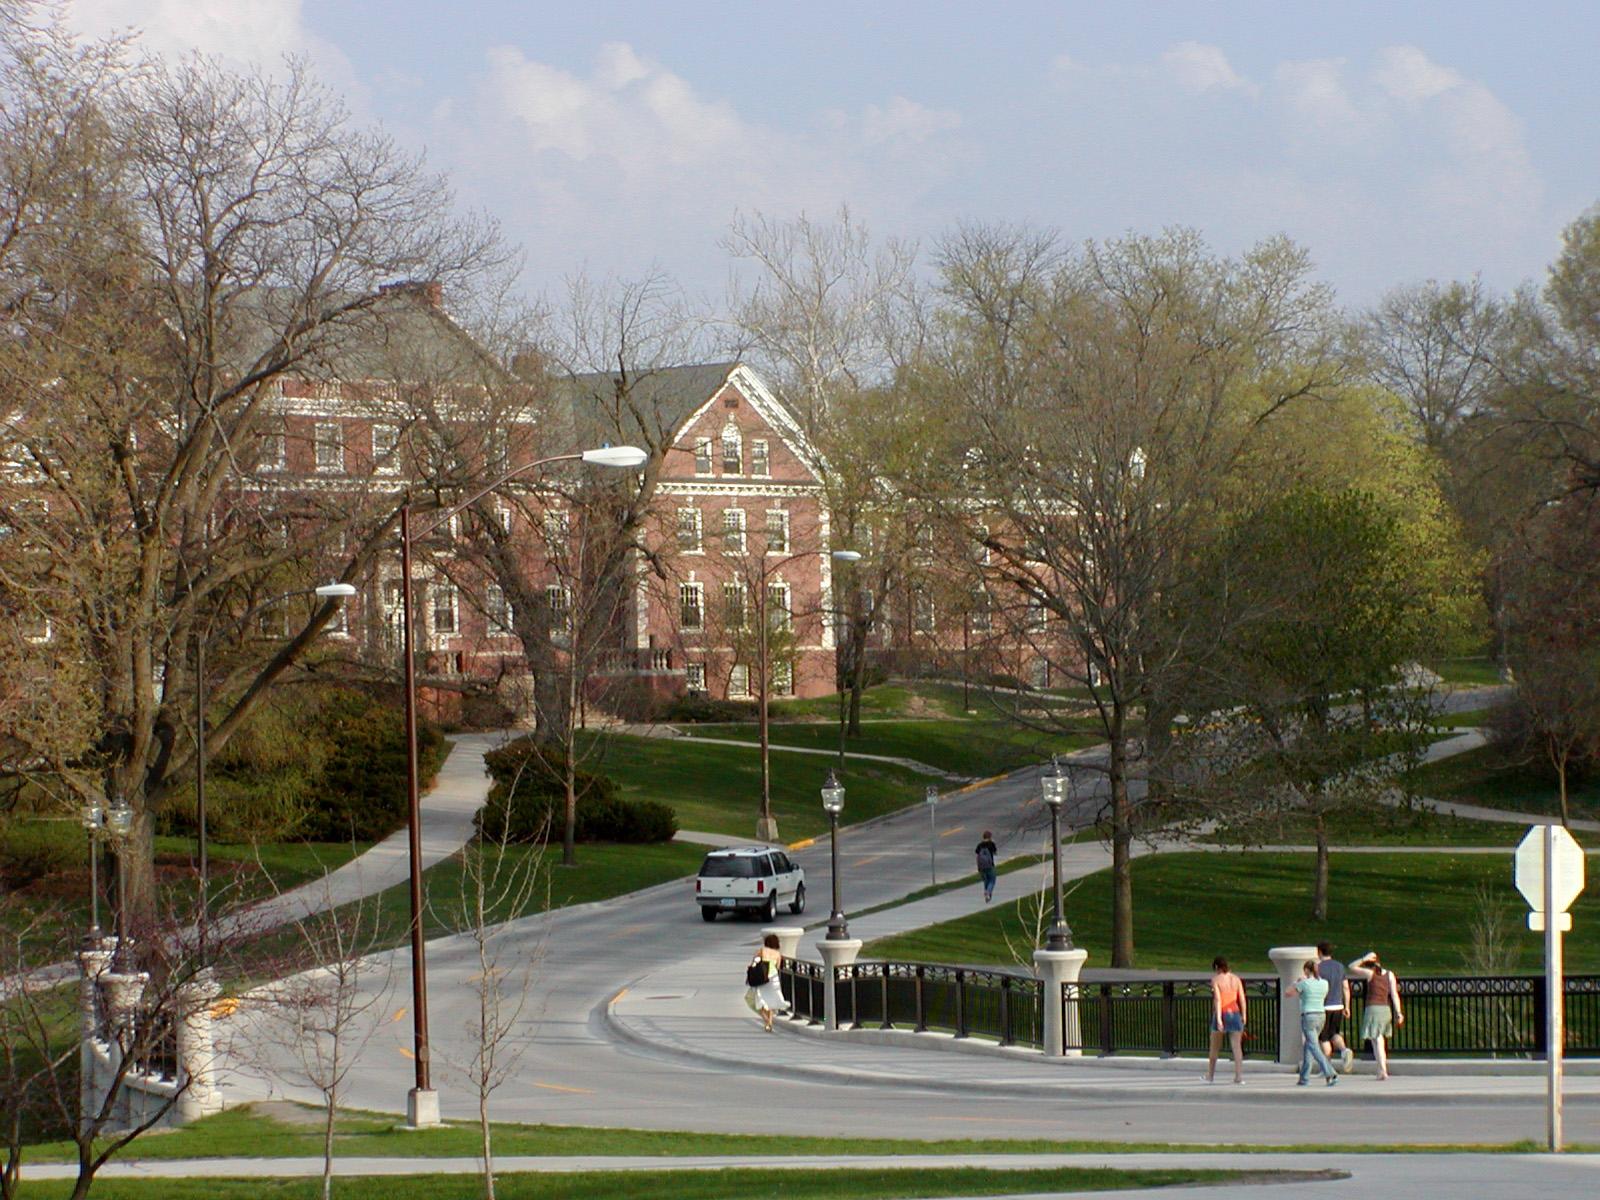 Iowa state university - From Wikipedia By